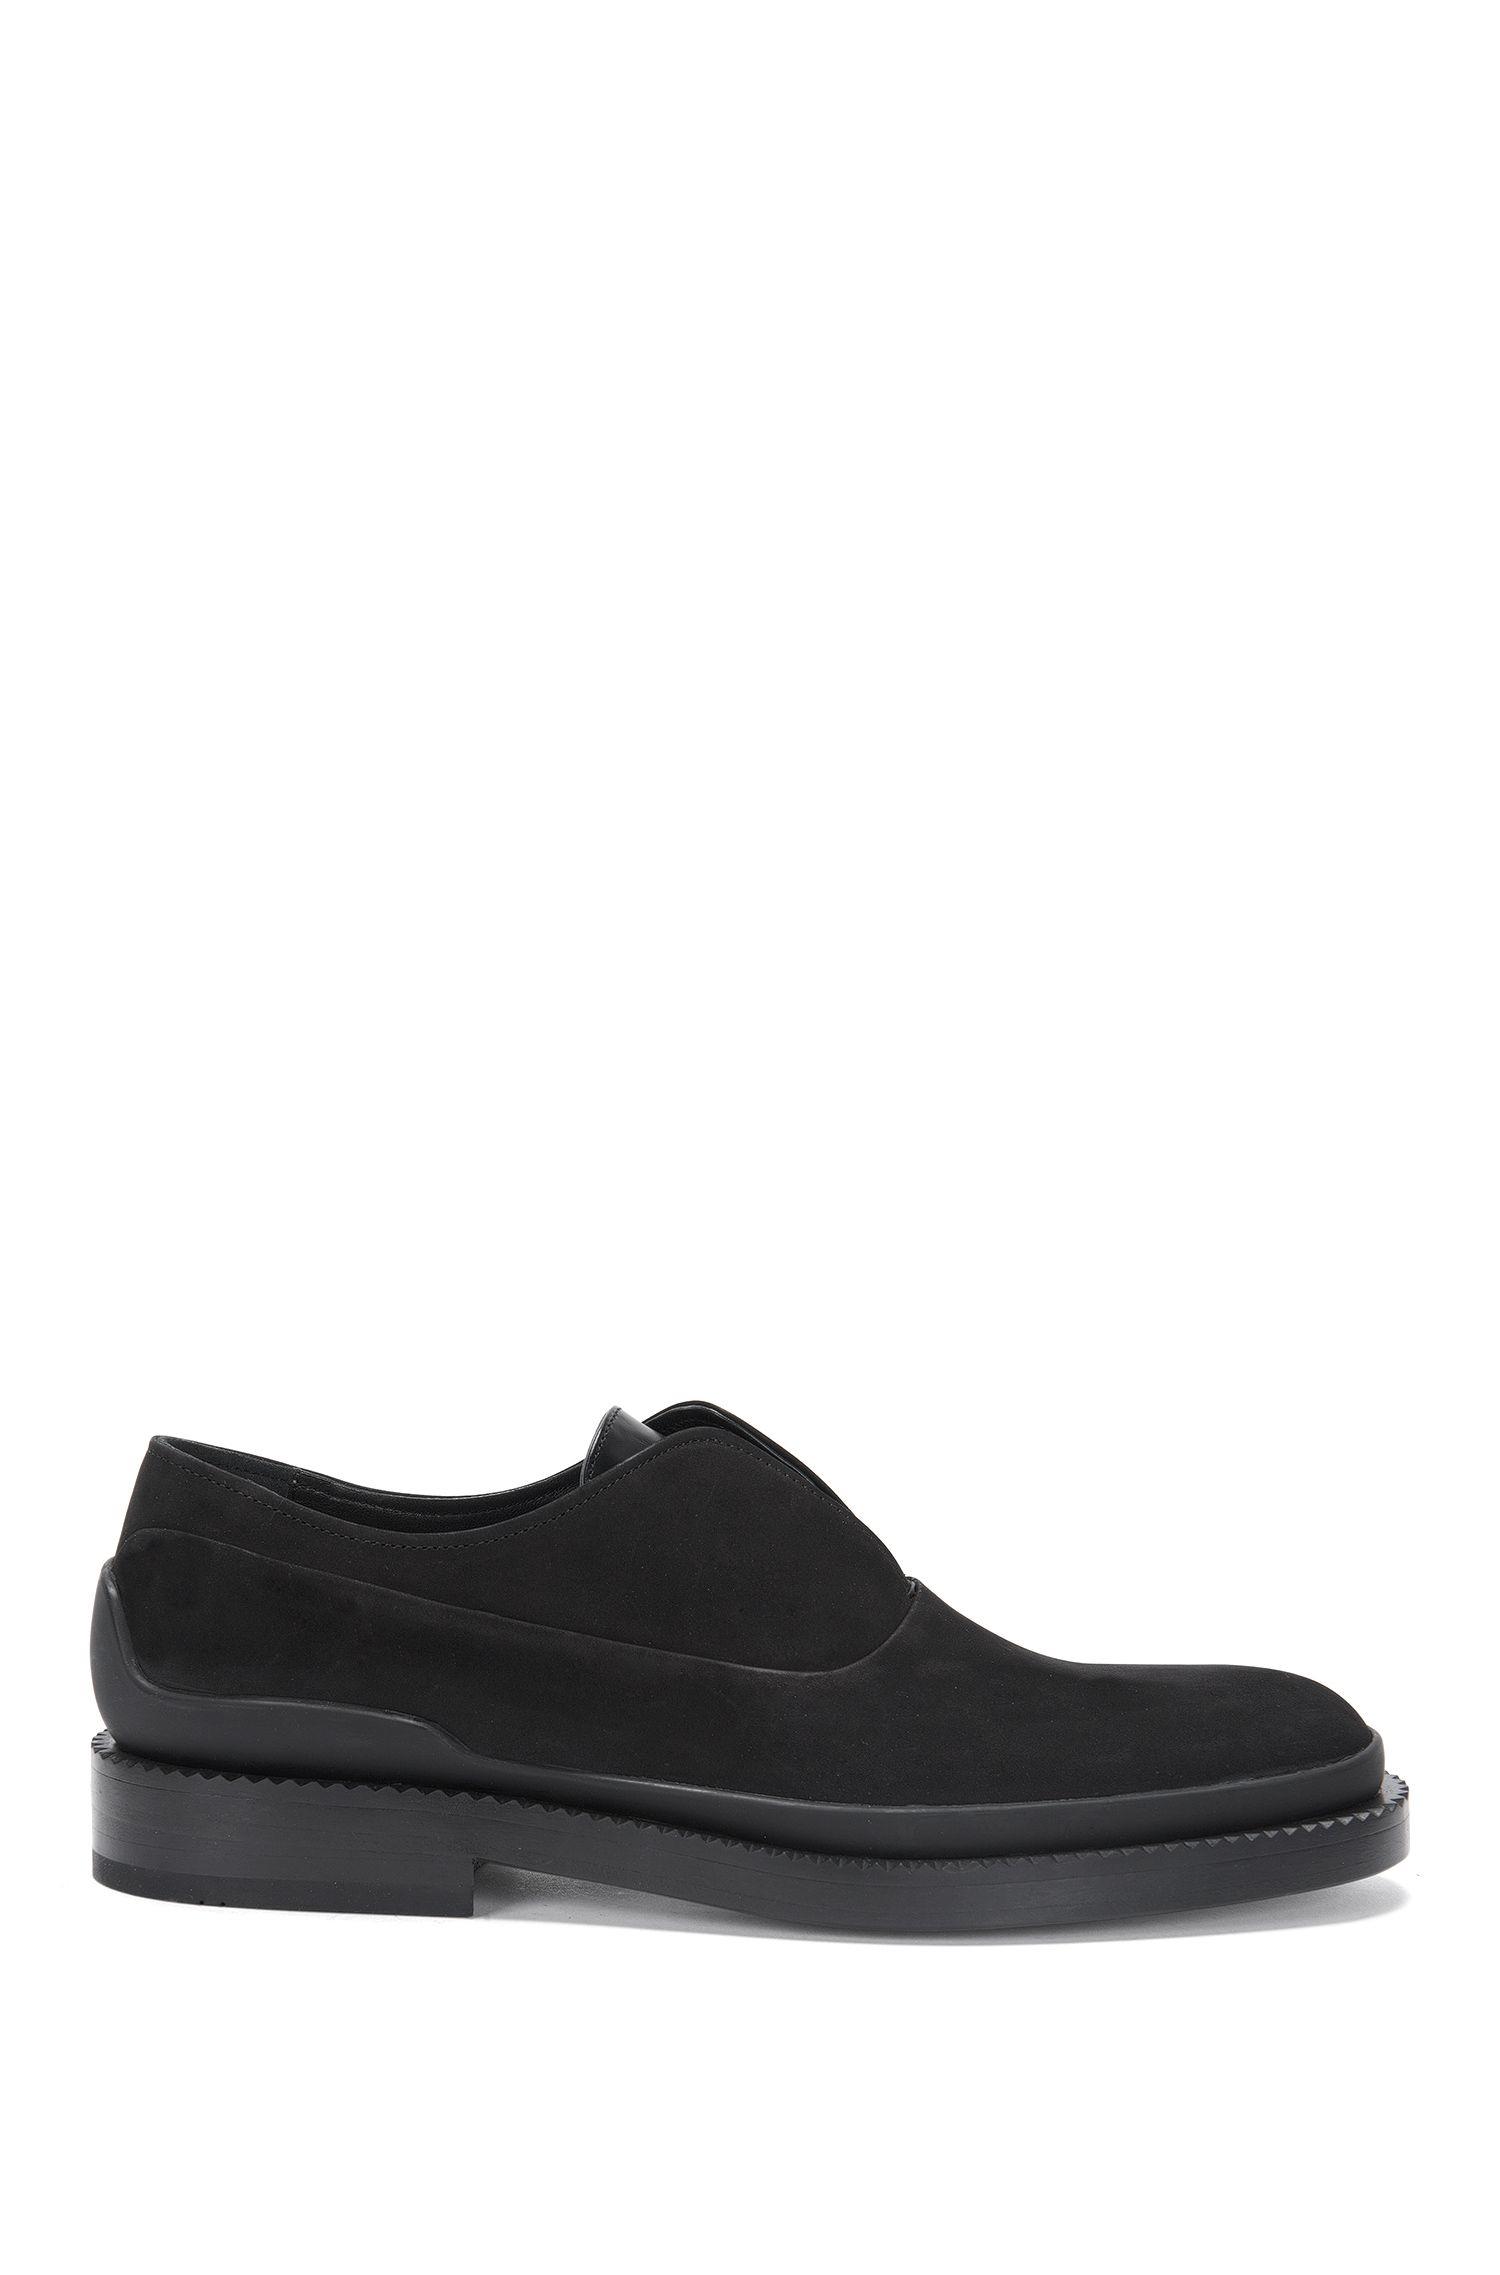 Nubuck Calfskin Loafer | Mono Oxfr Nu